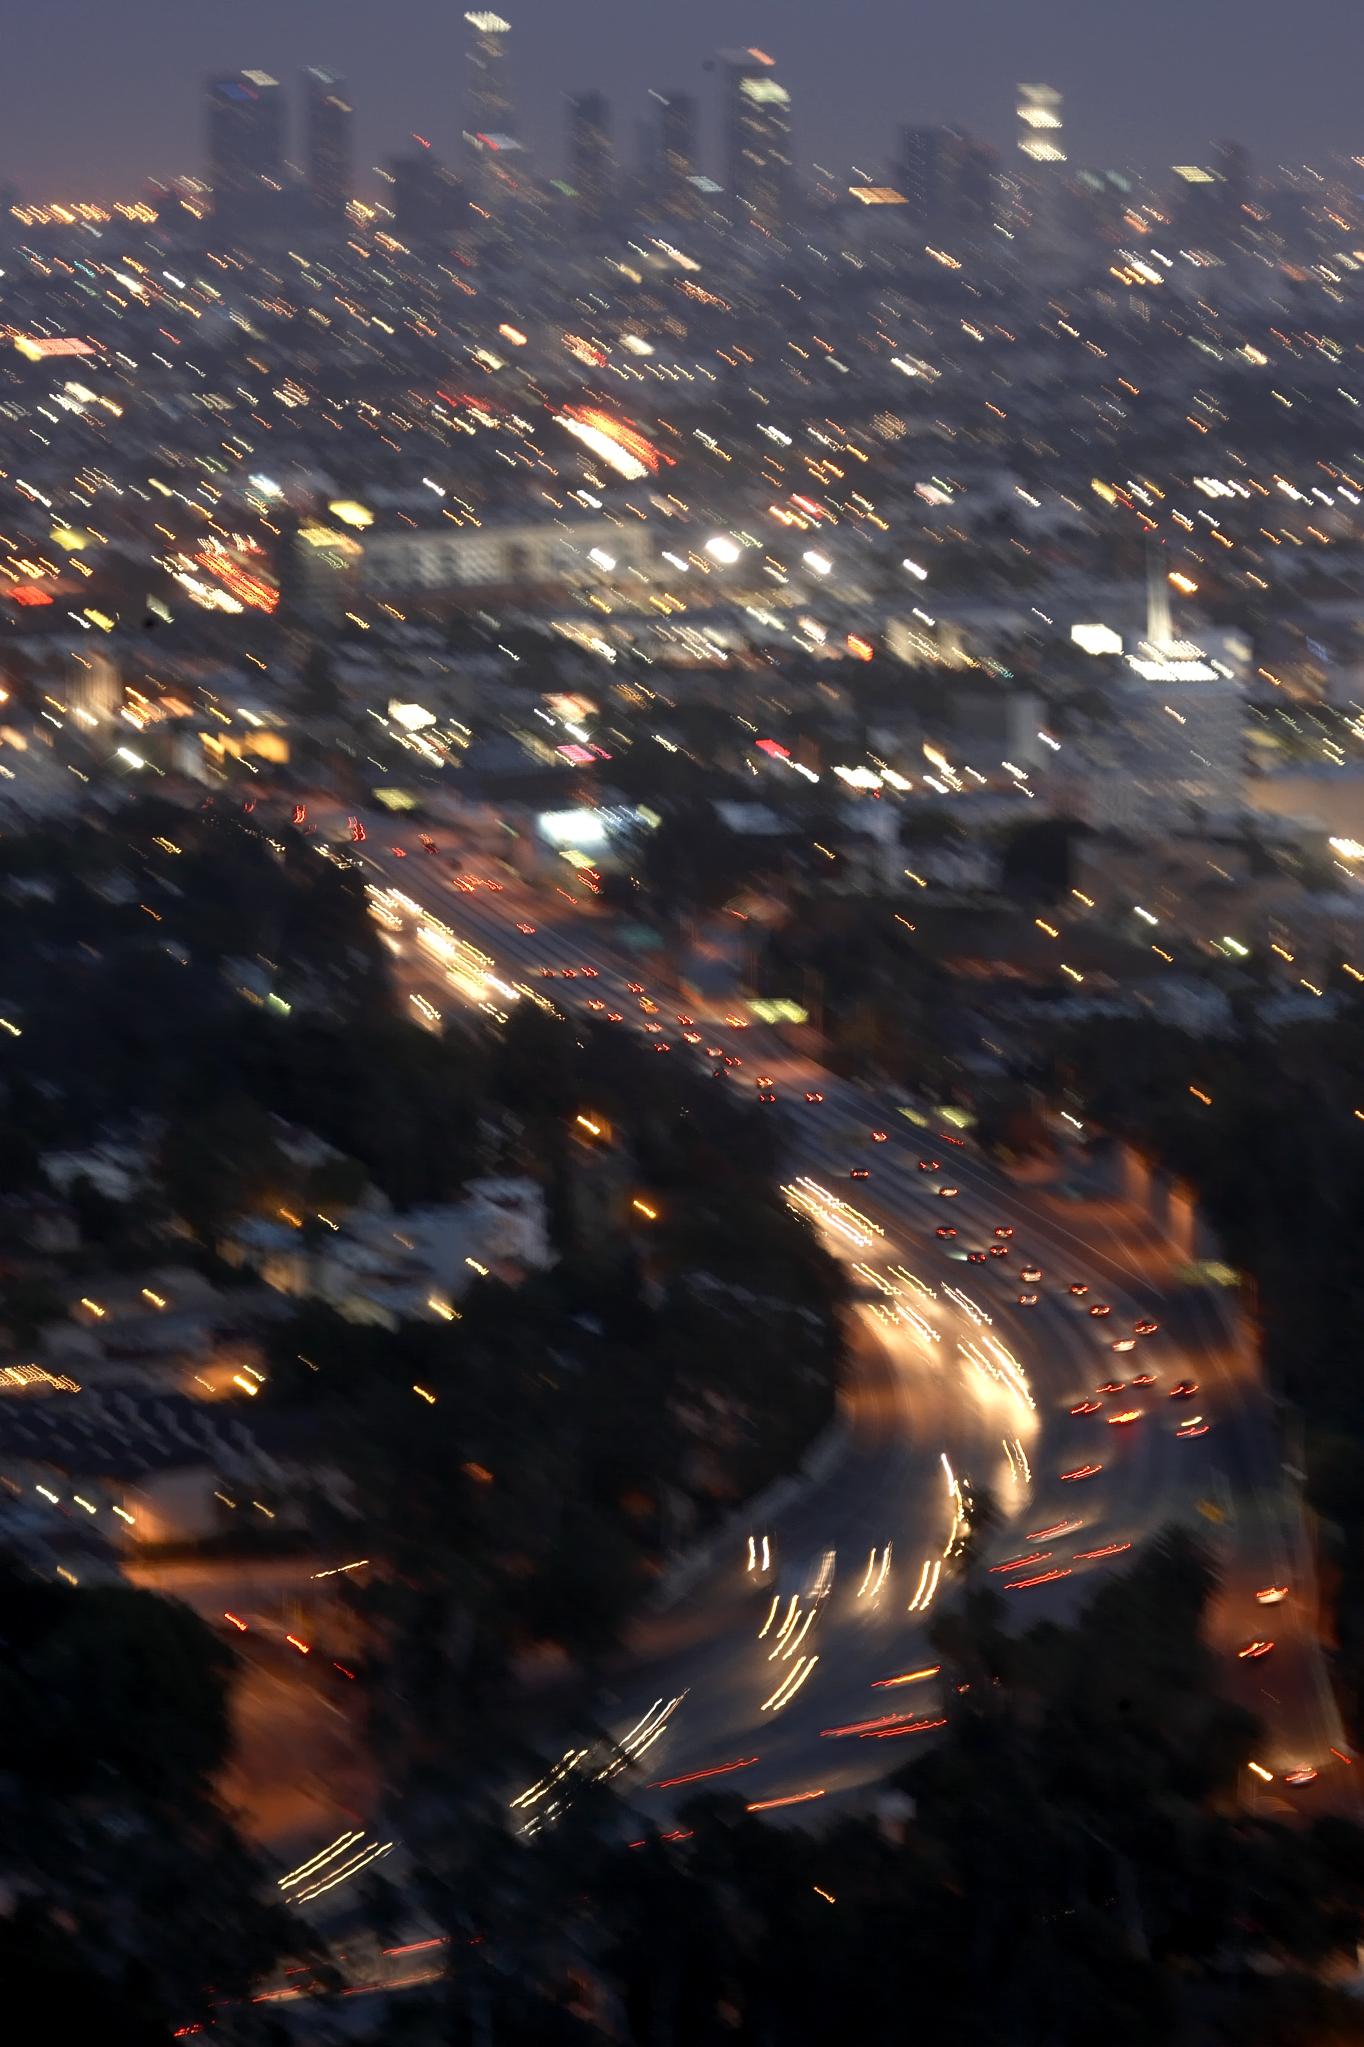 052512_Downtown fwys 0100164.jpg